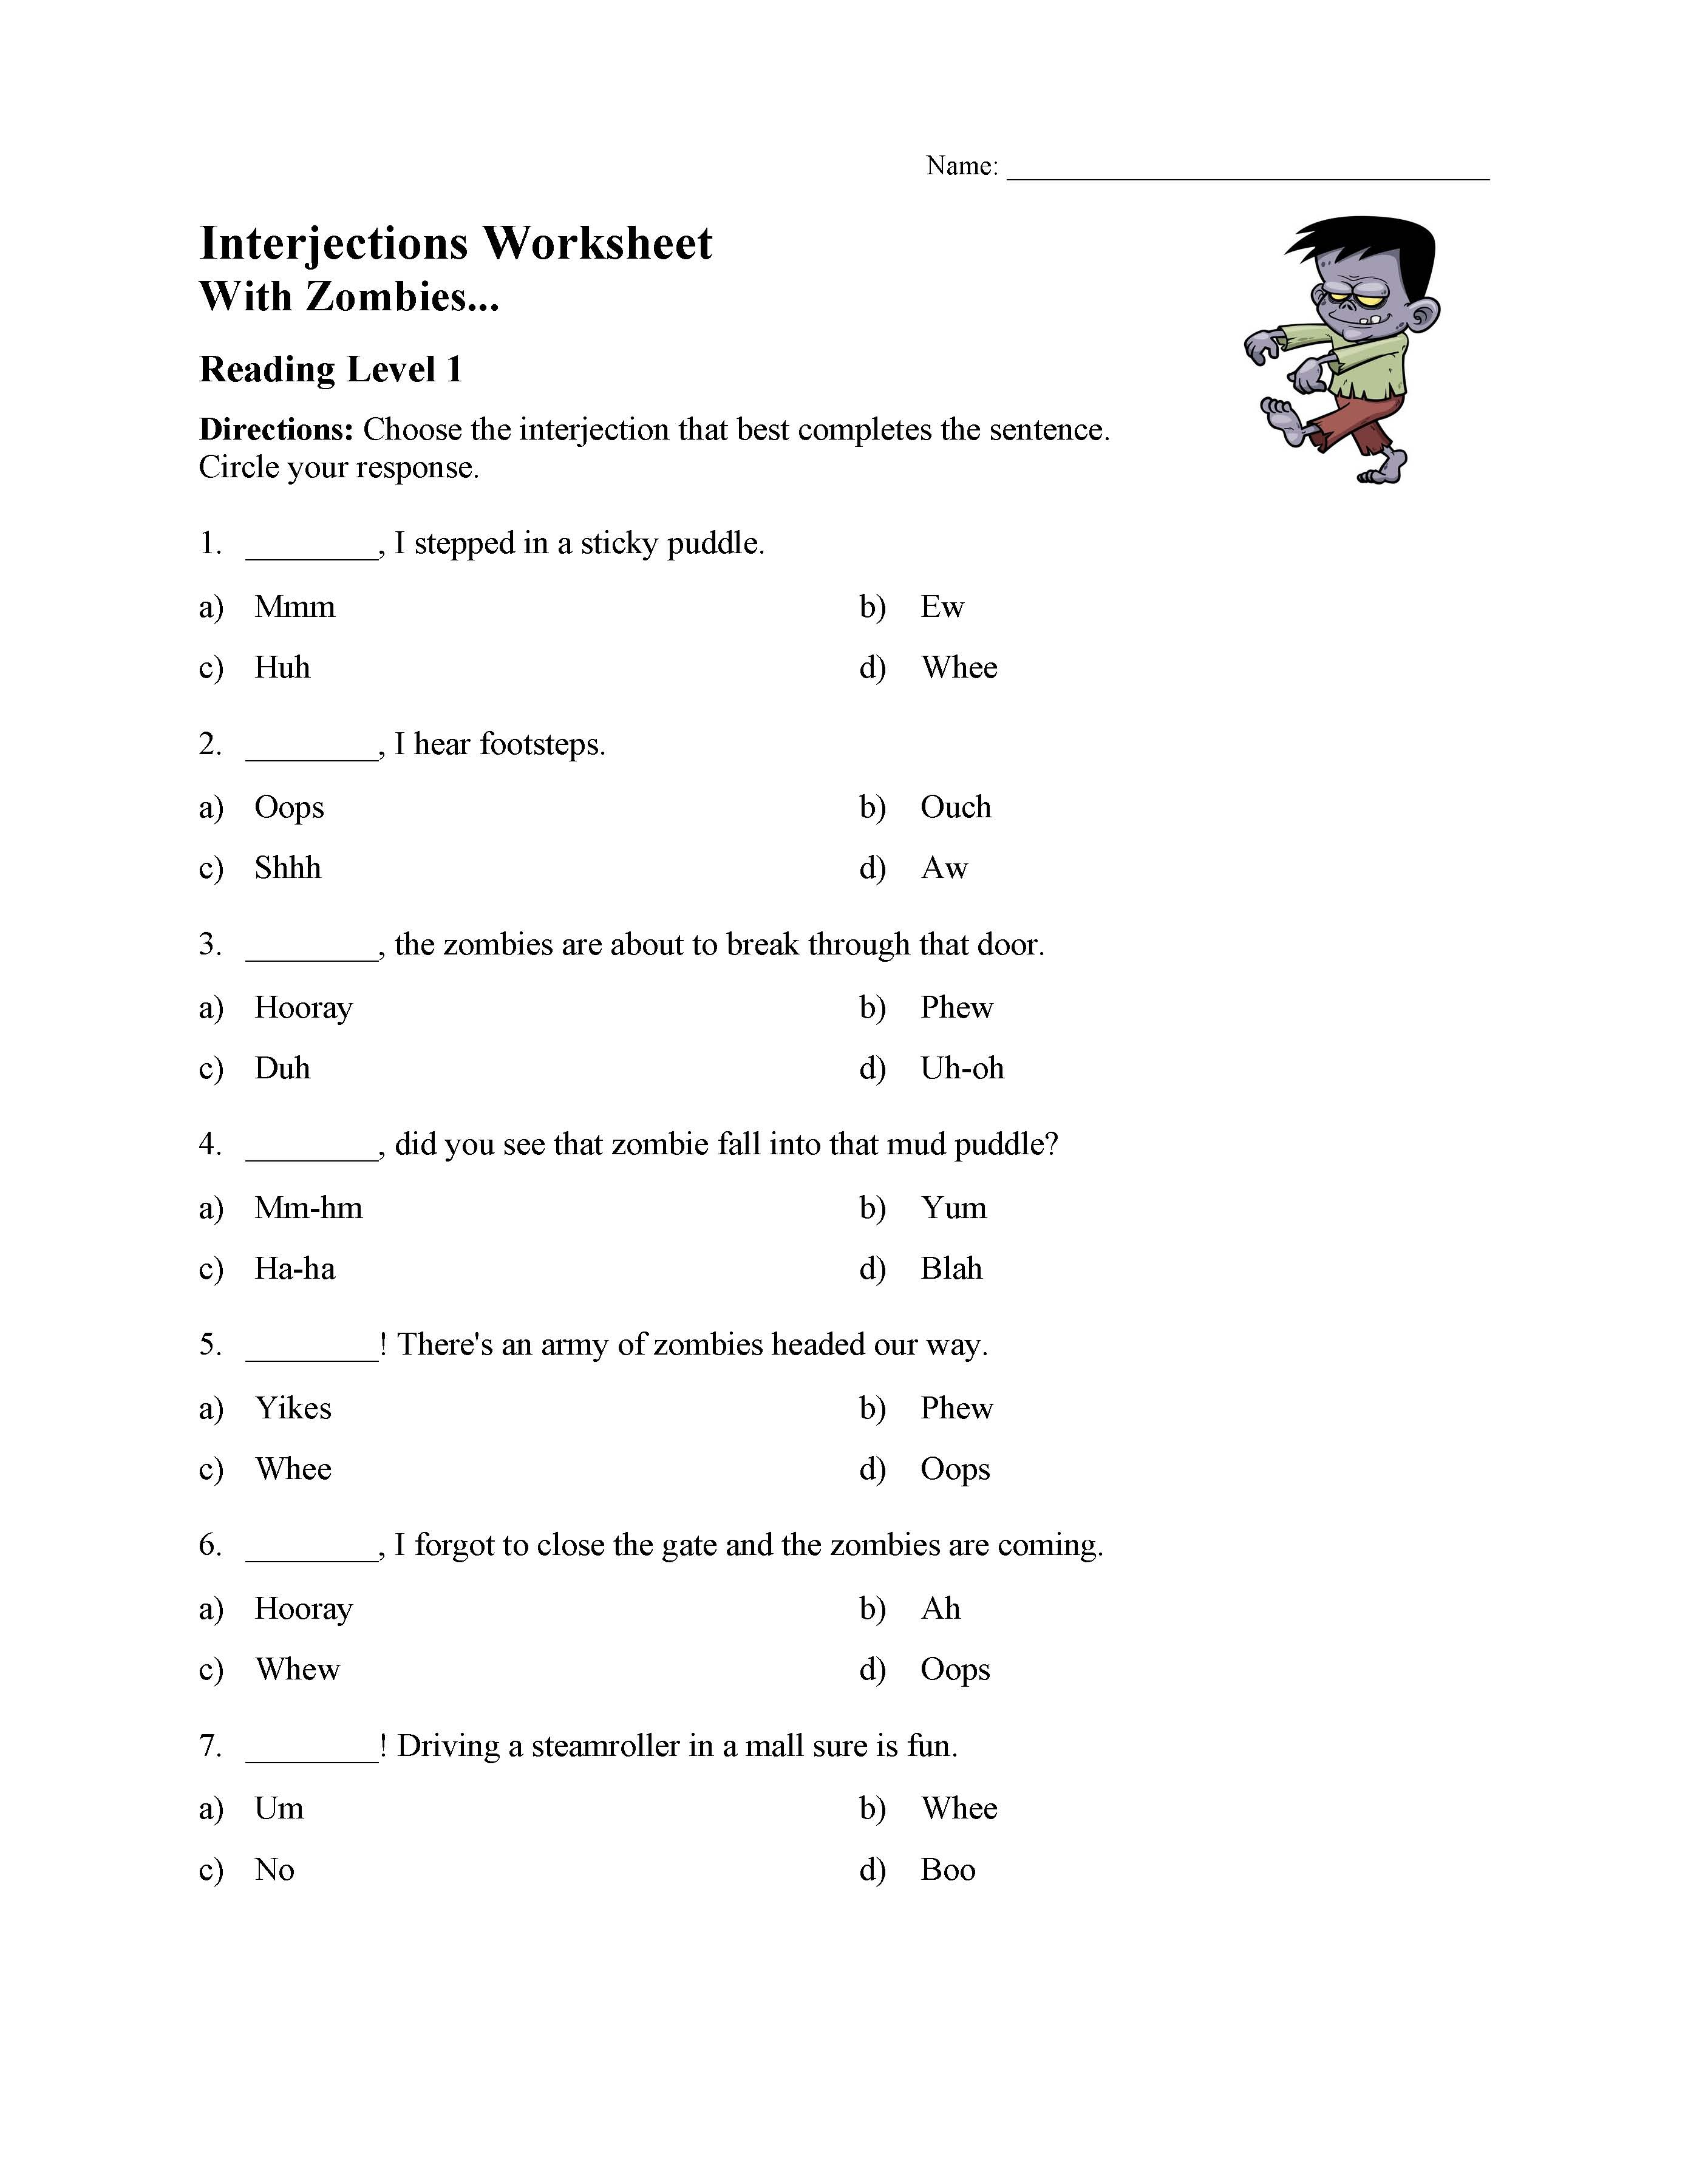 Interjections Worksheet 5th Grade